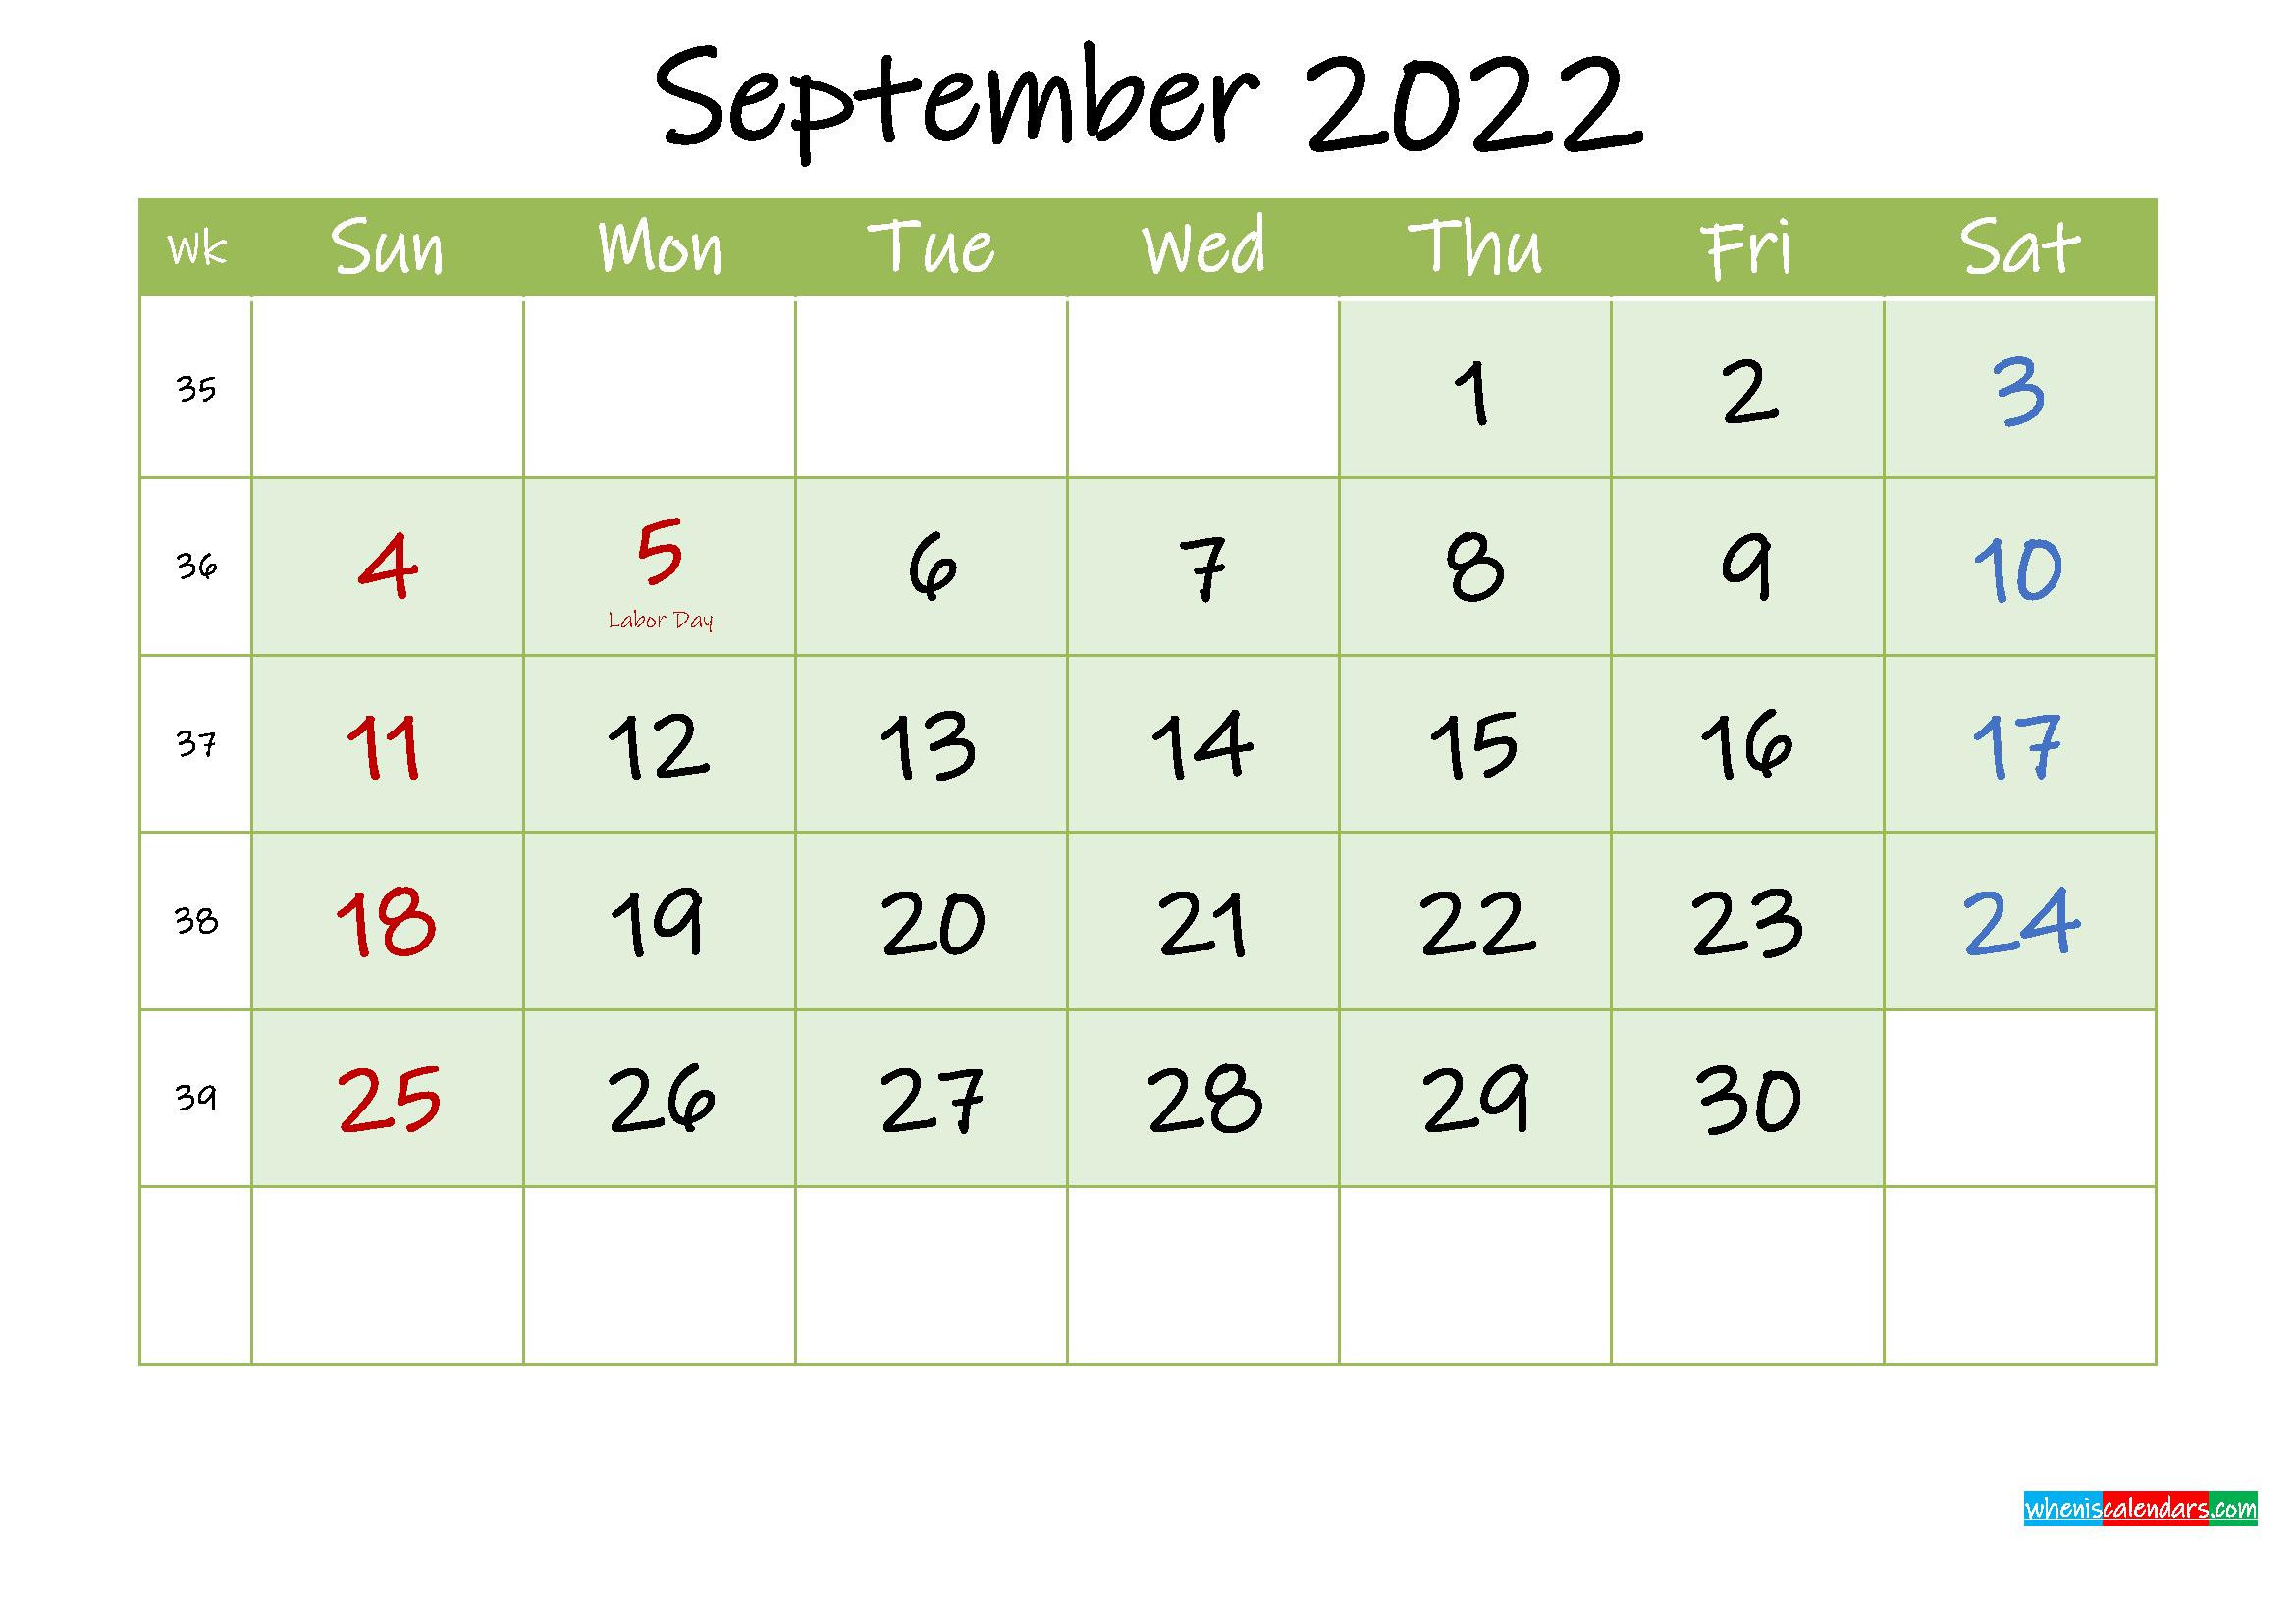 September 2022 Free Printable Calendar - Template Ink22M129 regarding Print July 2022 Ckander